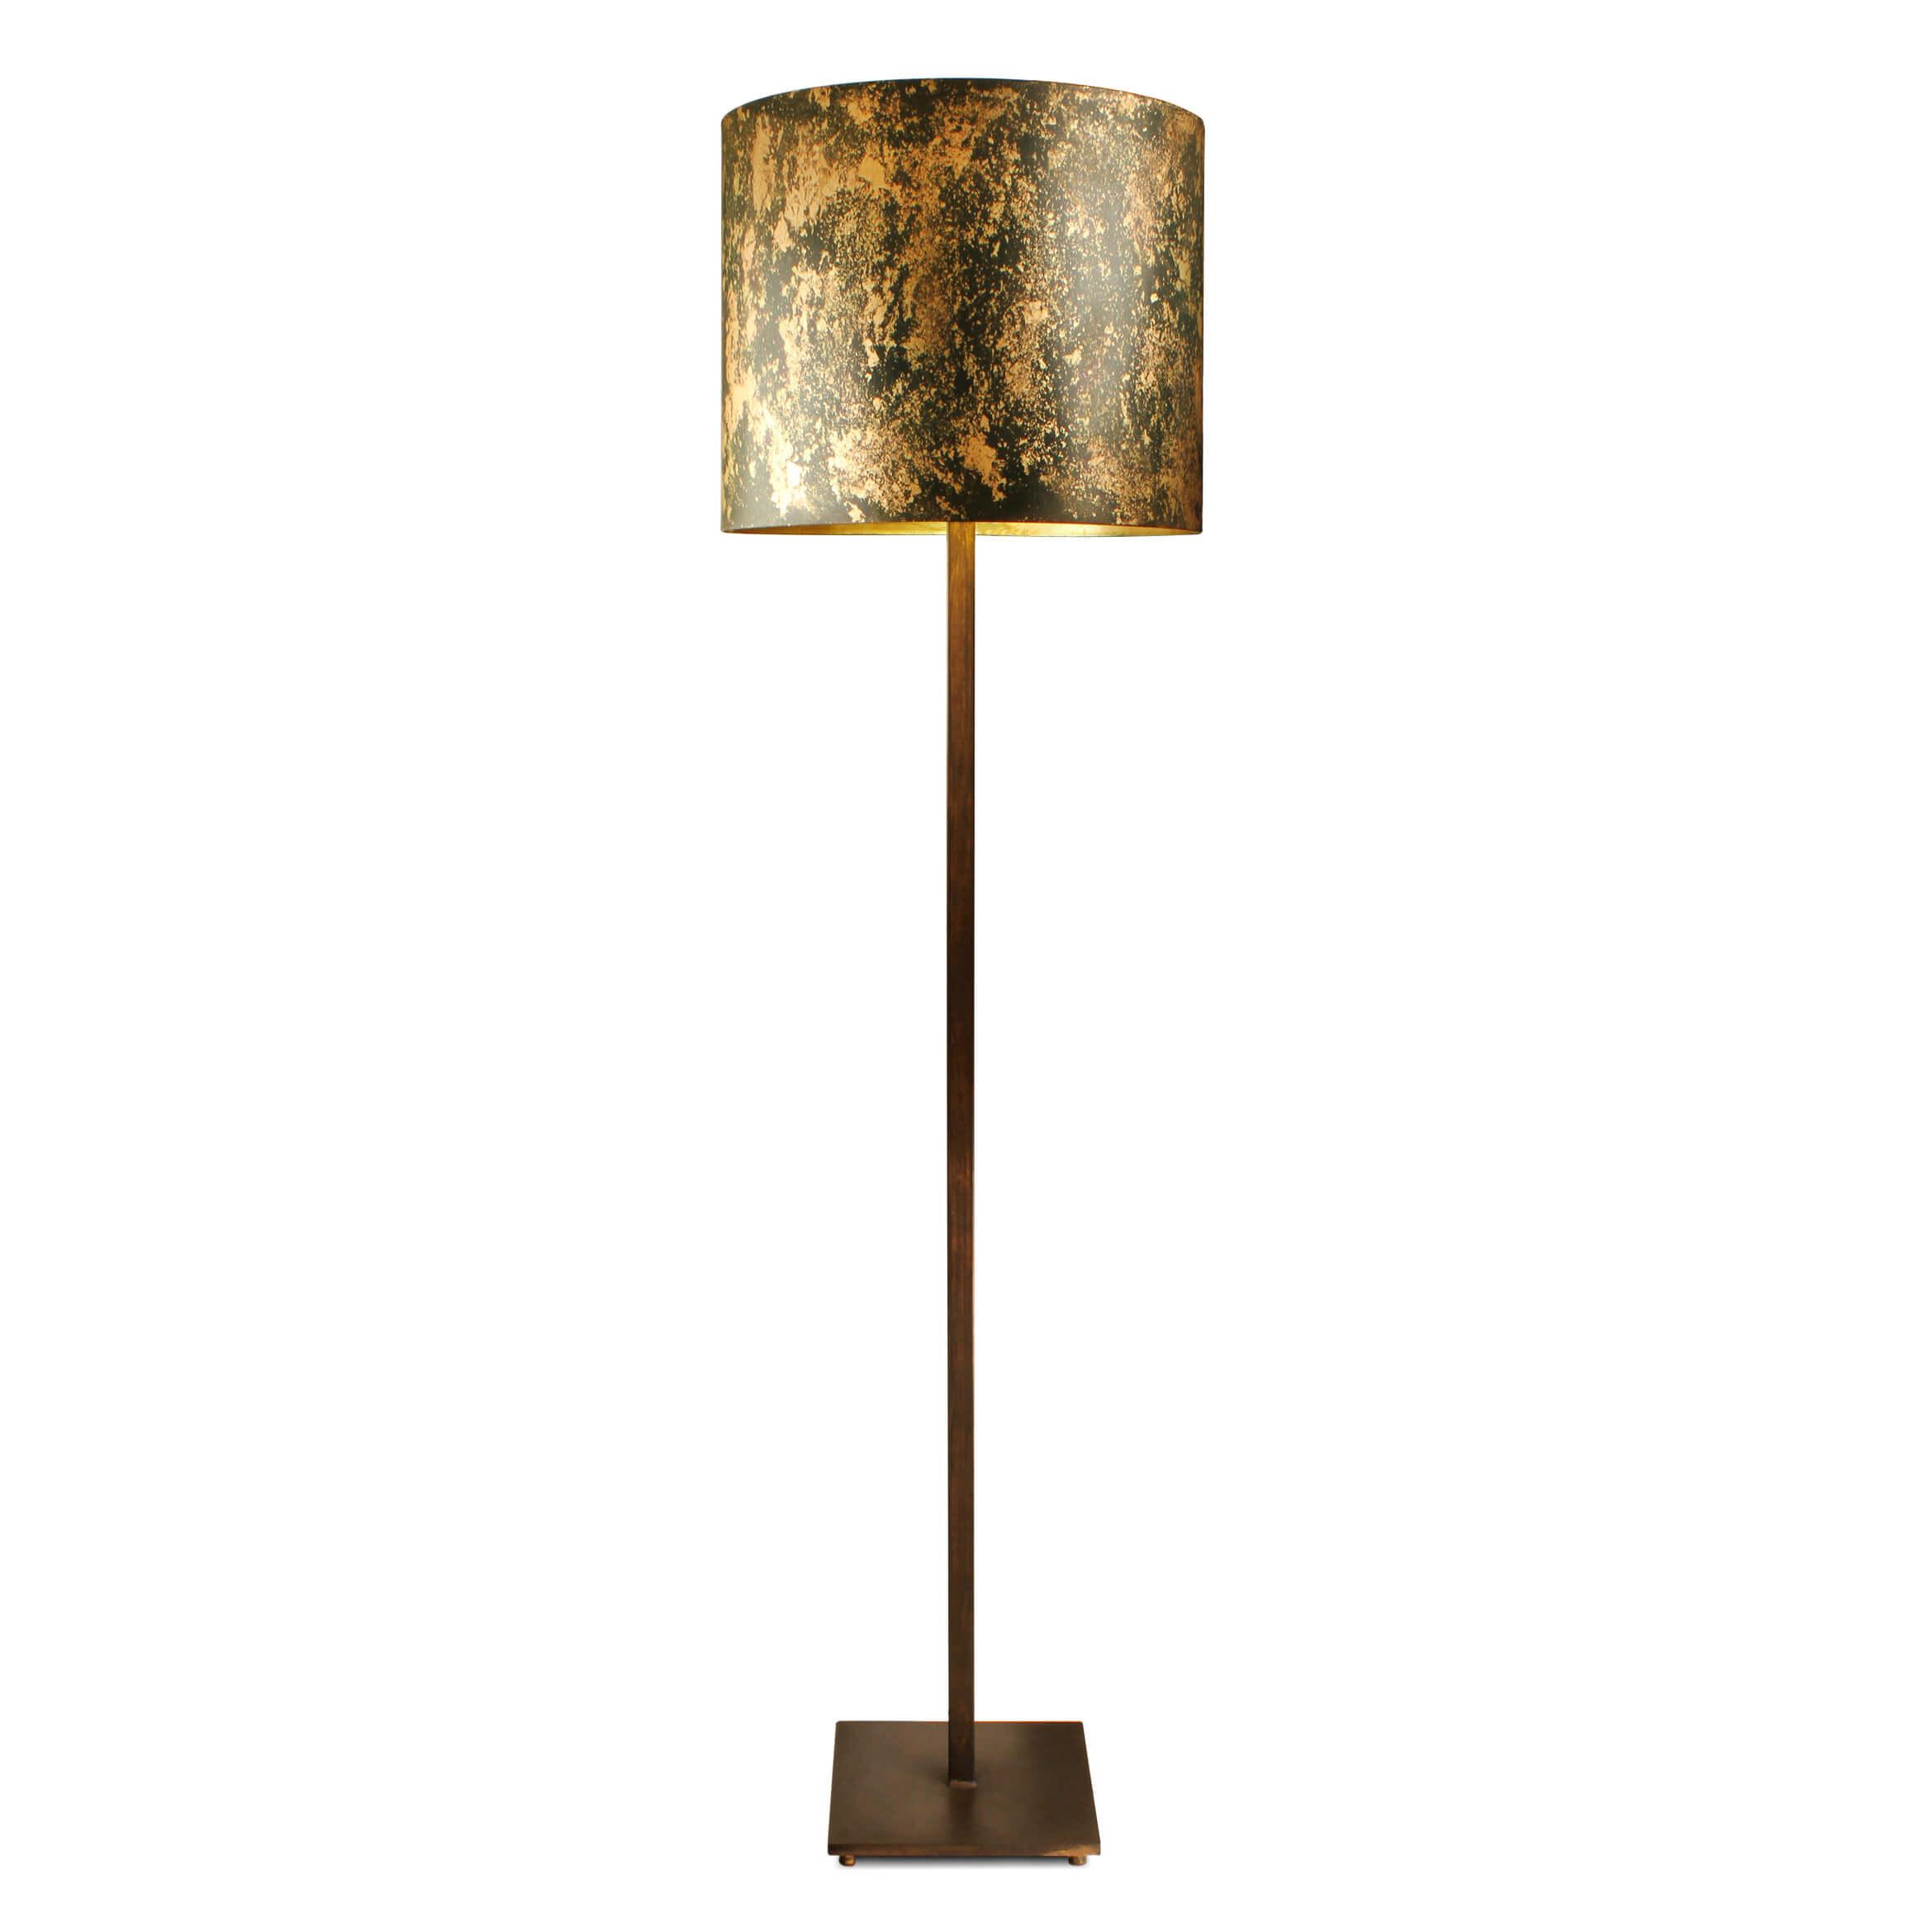 round shade furniture shape lamp home black floor ideas drum featuring base splendid modern color copper of kopyok lamps design pretty metal